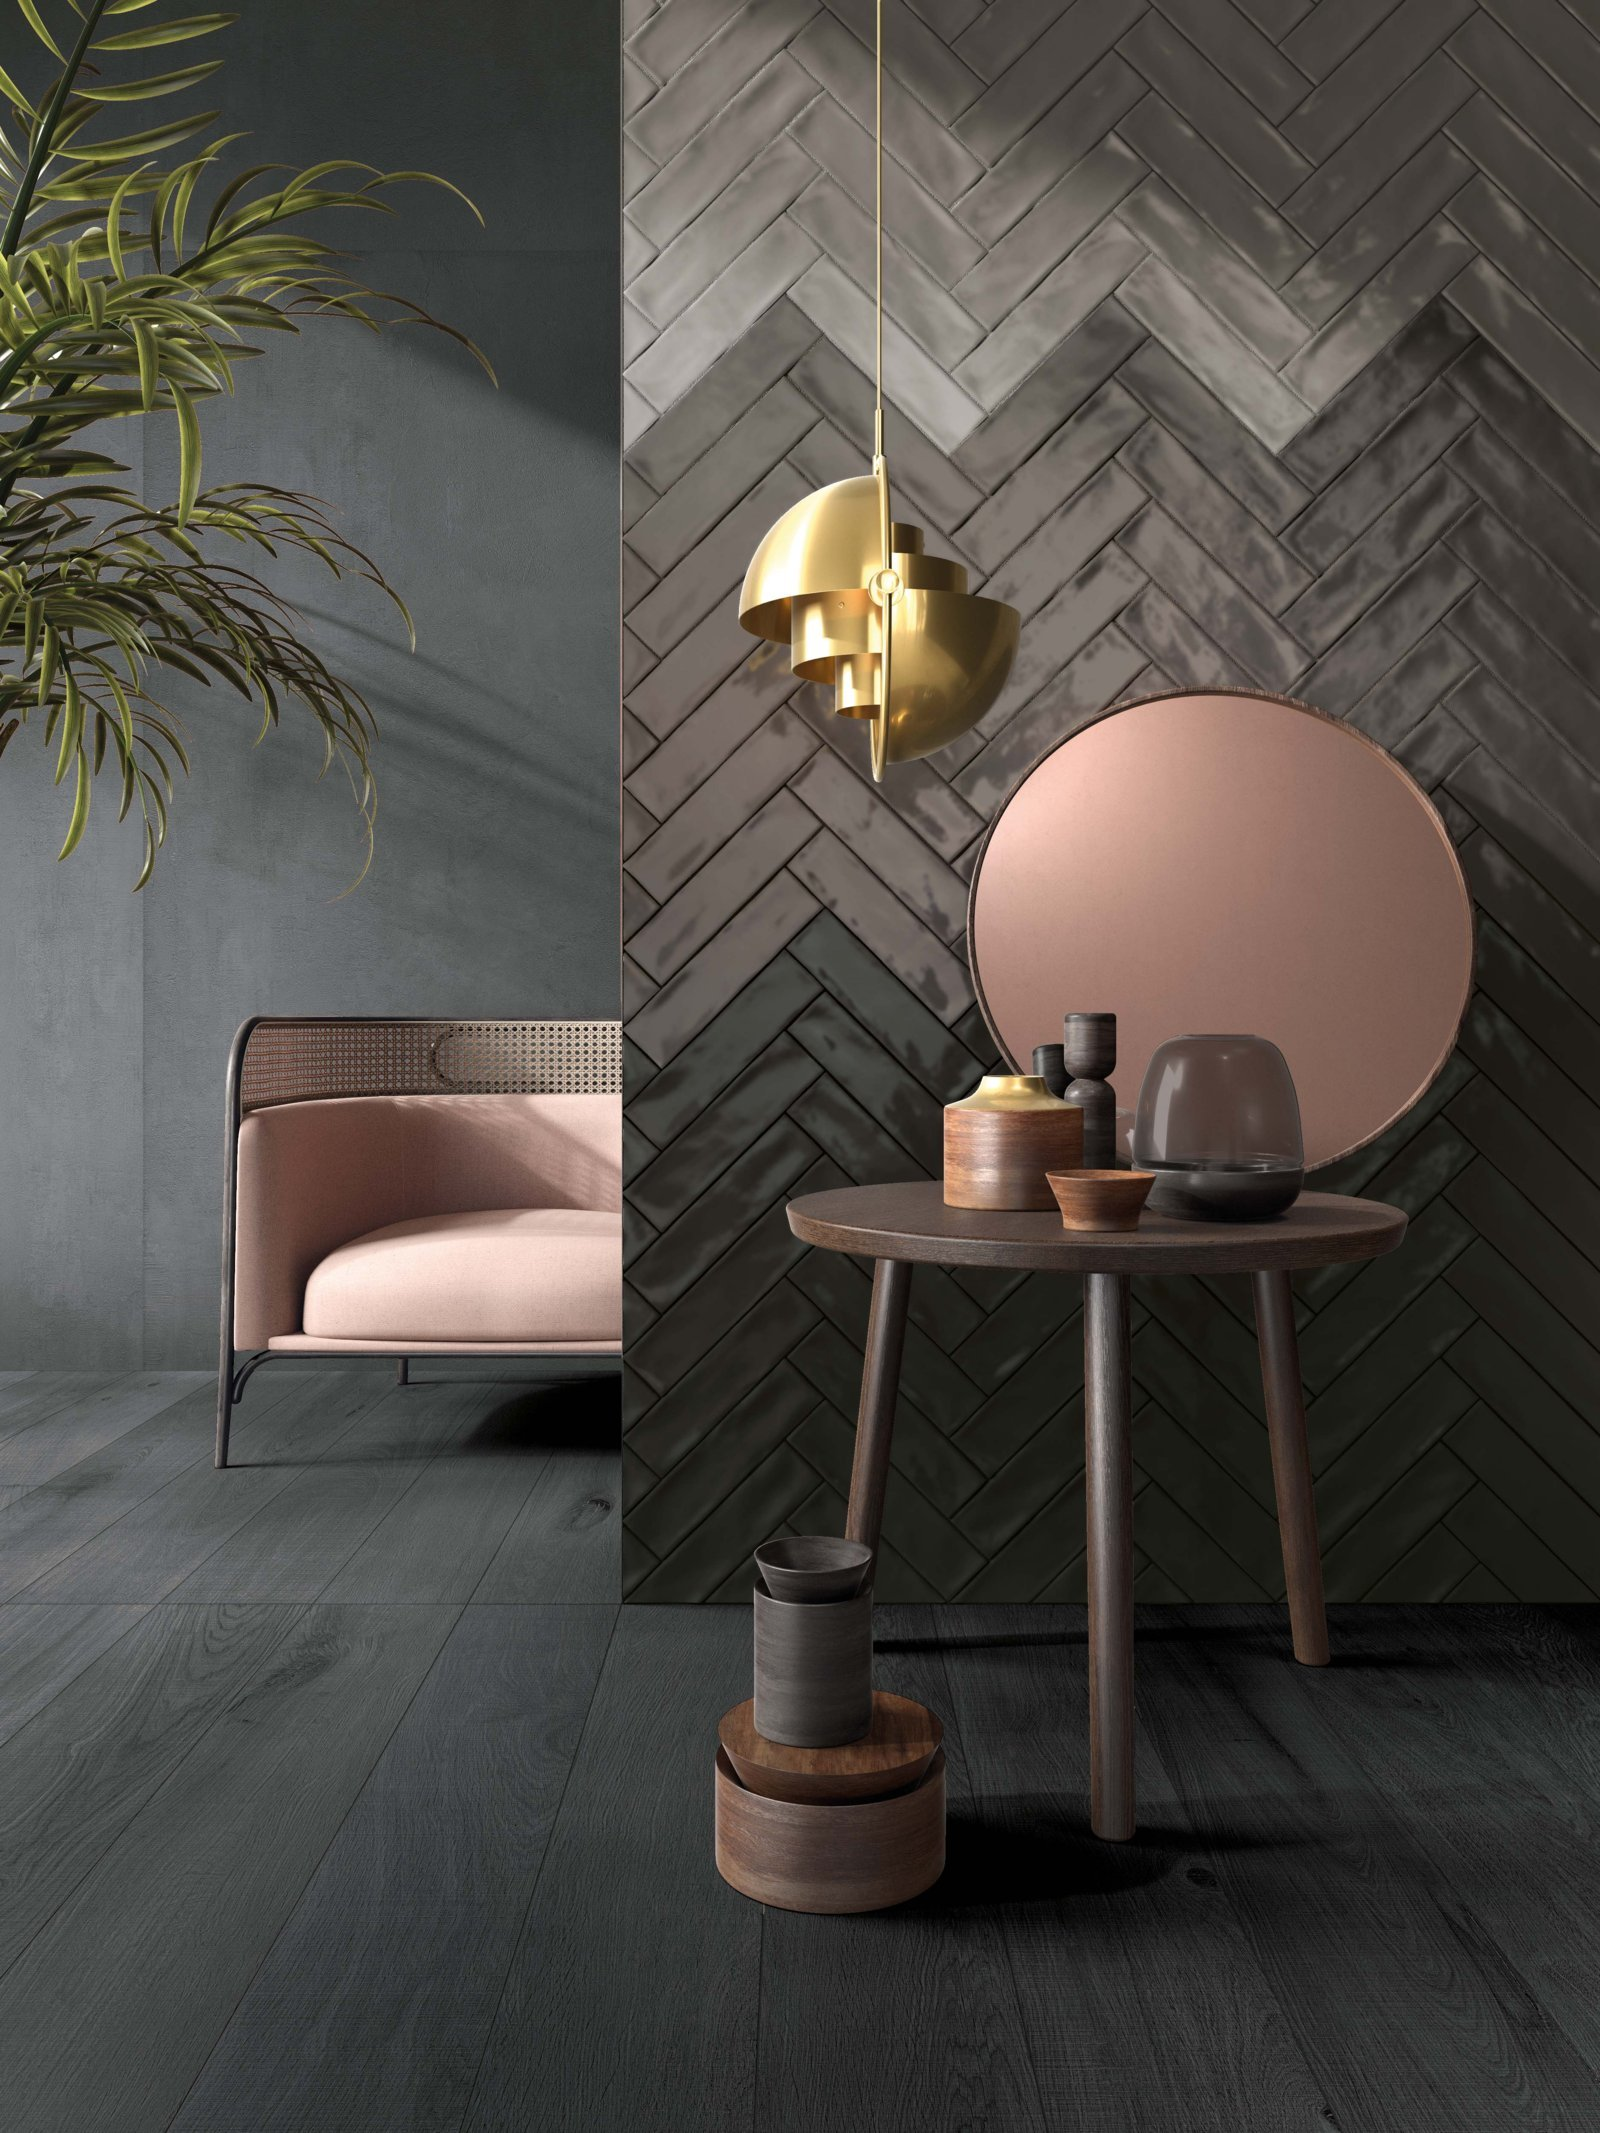 Herringbone pattern tile layout